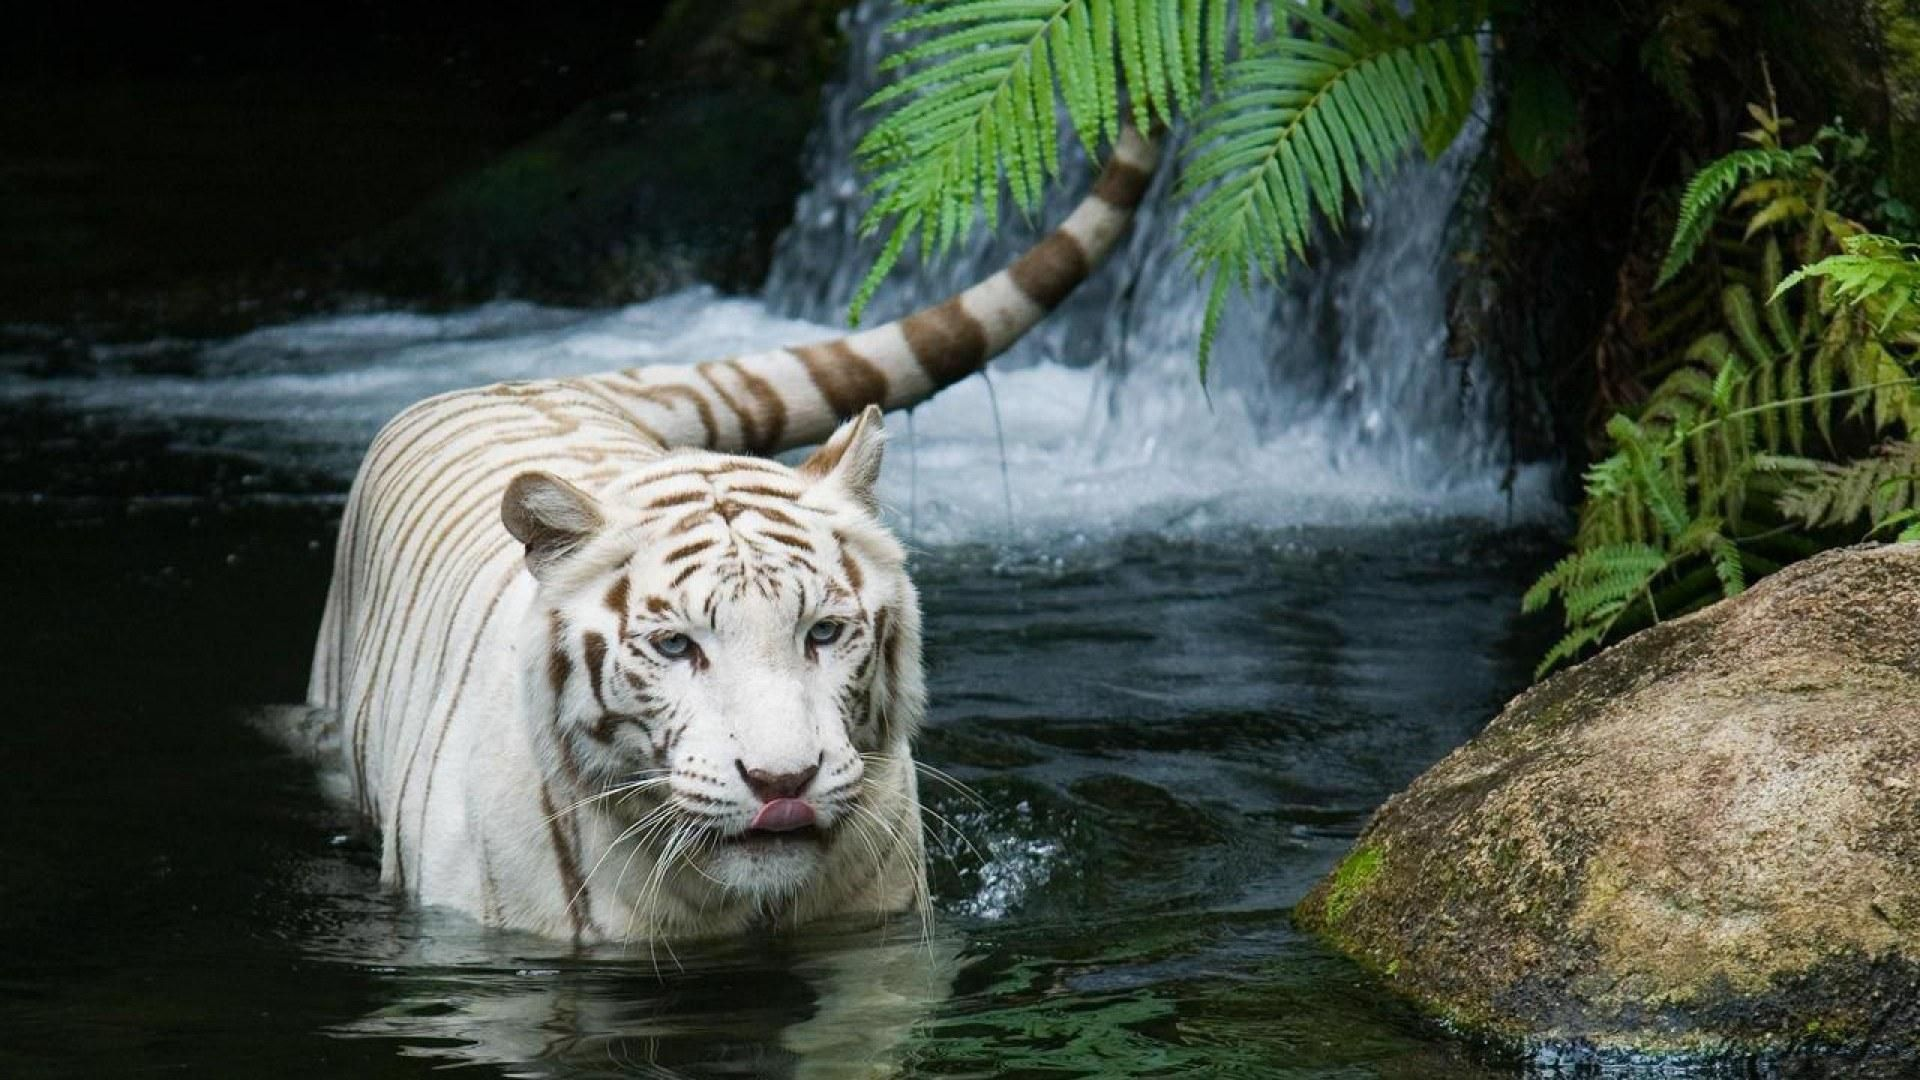 Hd Wallpapers 1080p Hd Wallpapers White Tiger Wallpaper Hd